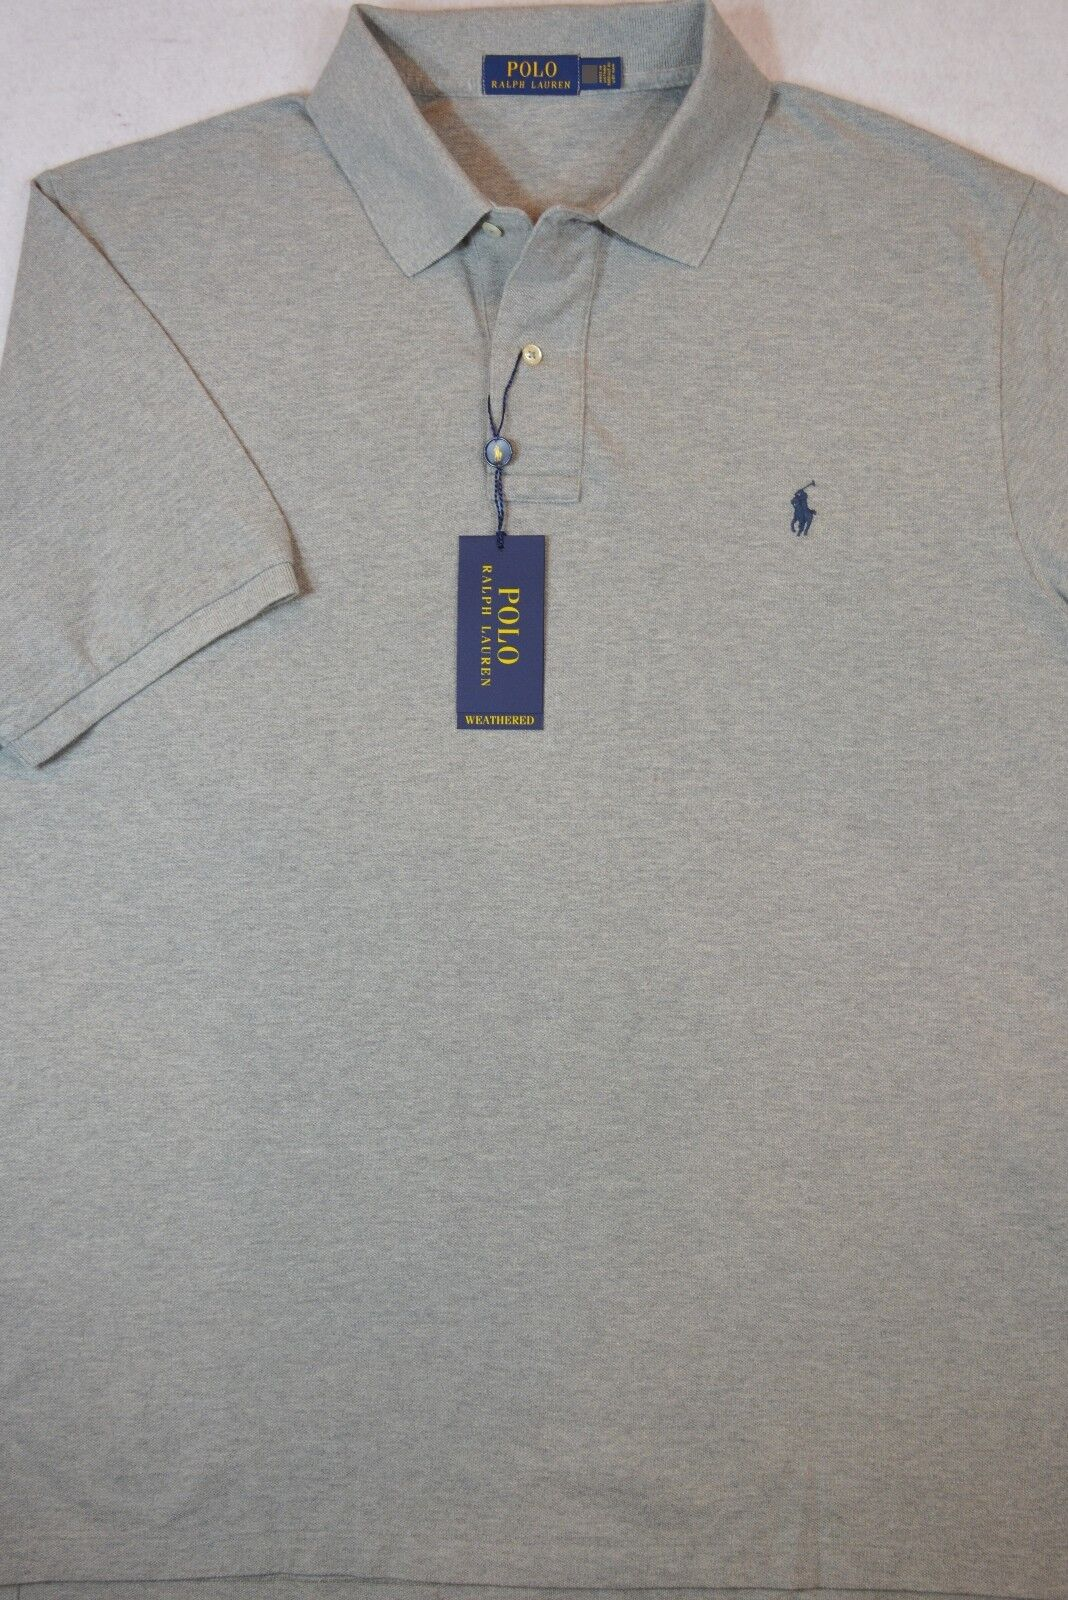 7ff39b0d Polo Ralph Lauren Weathered Mesh Shirt LT & XLT NWT orggpl25619 ...